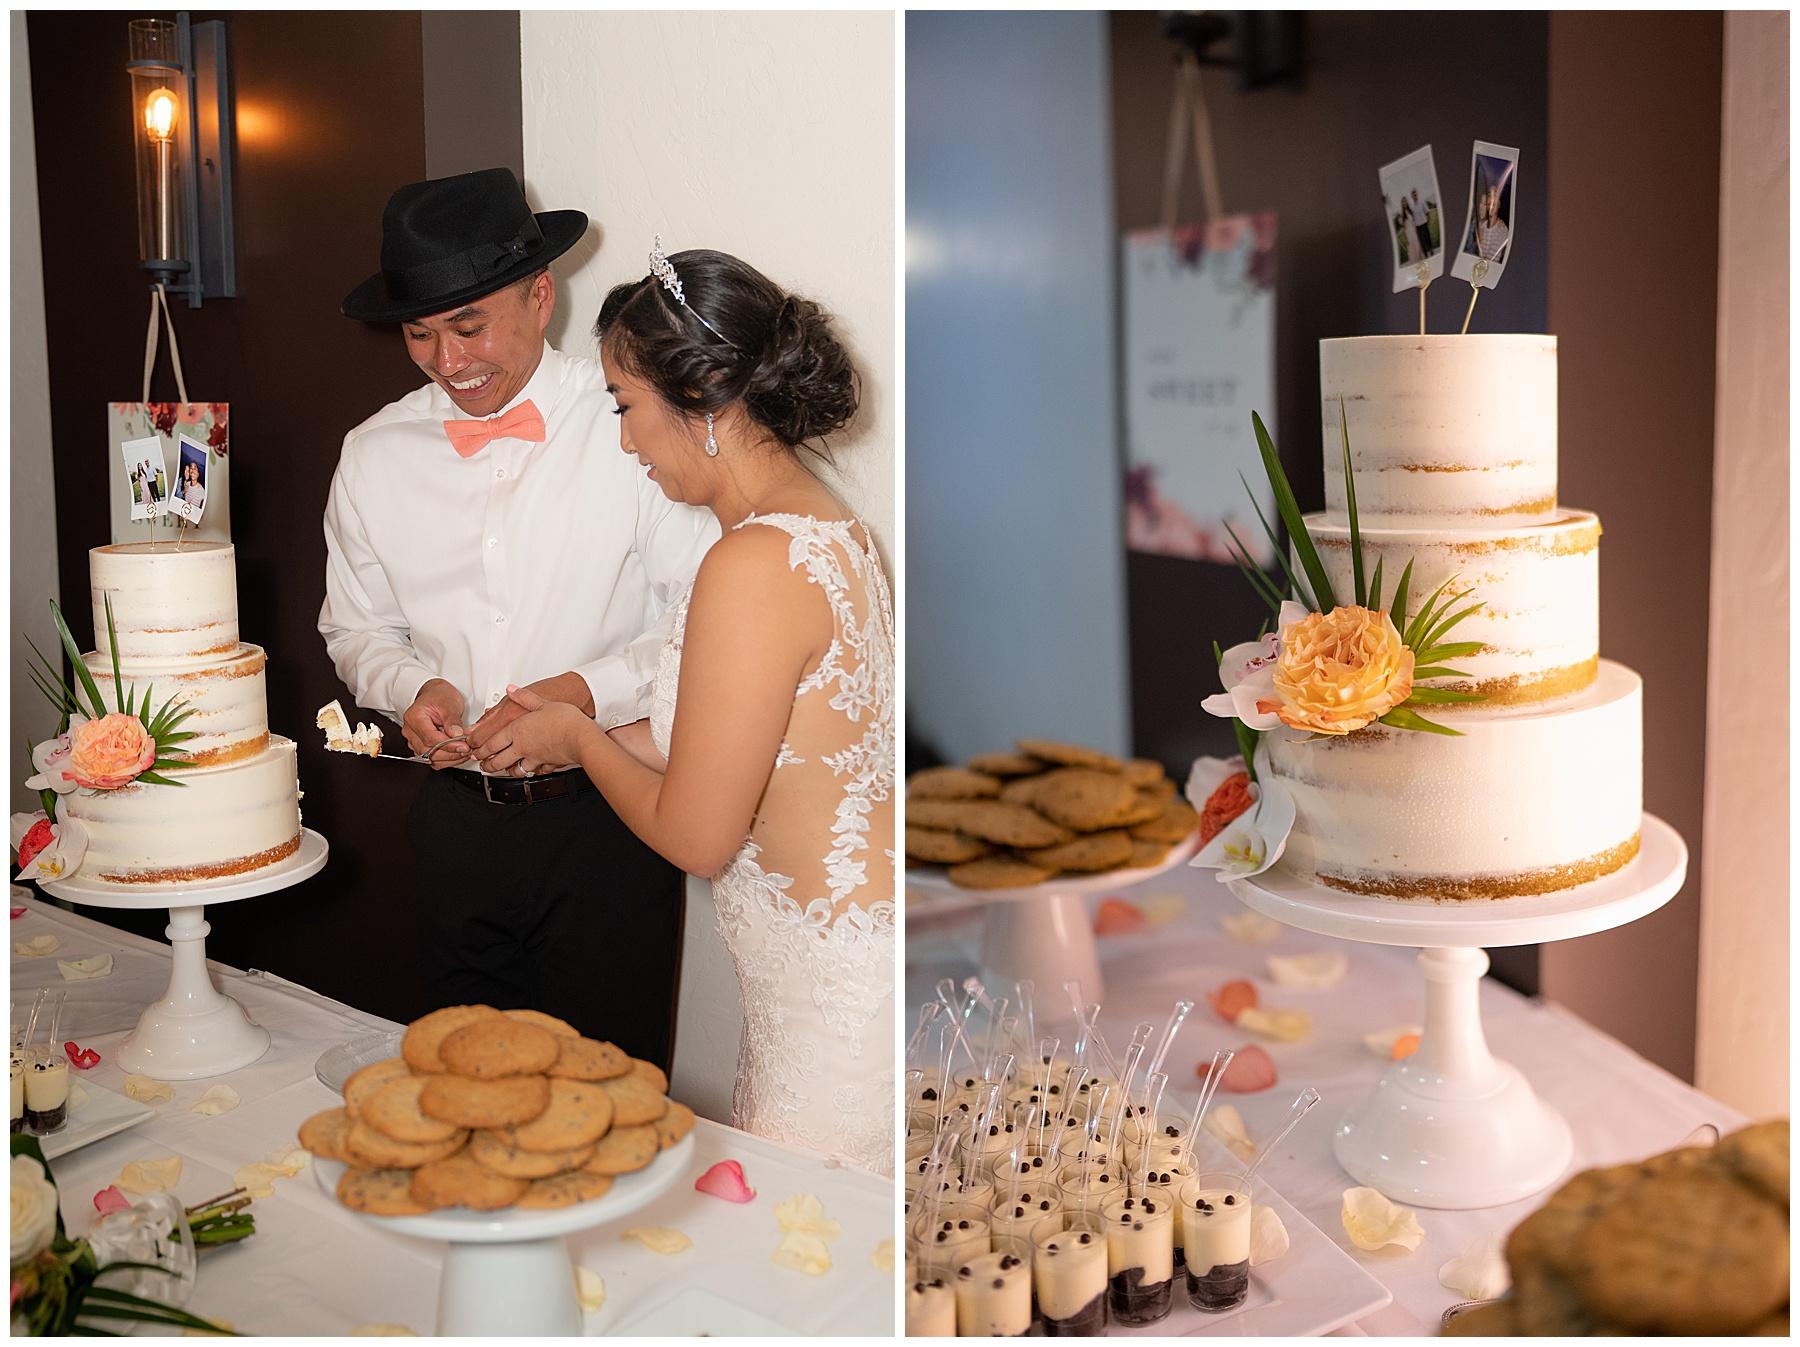 tom ham's lighthouse wedding cake cutting